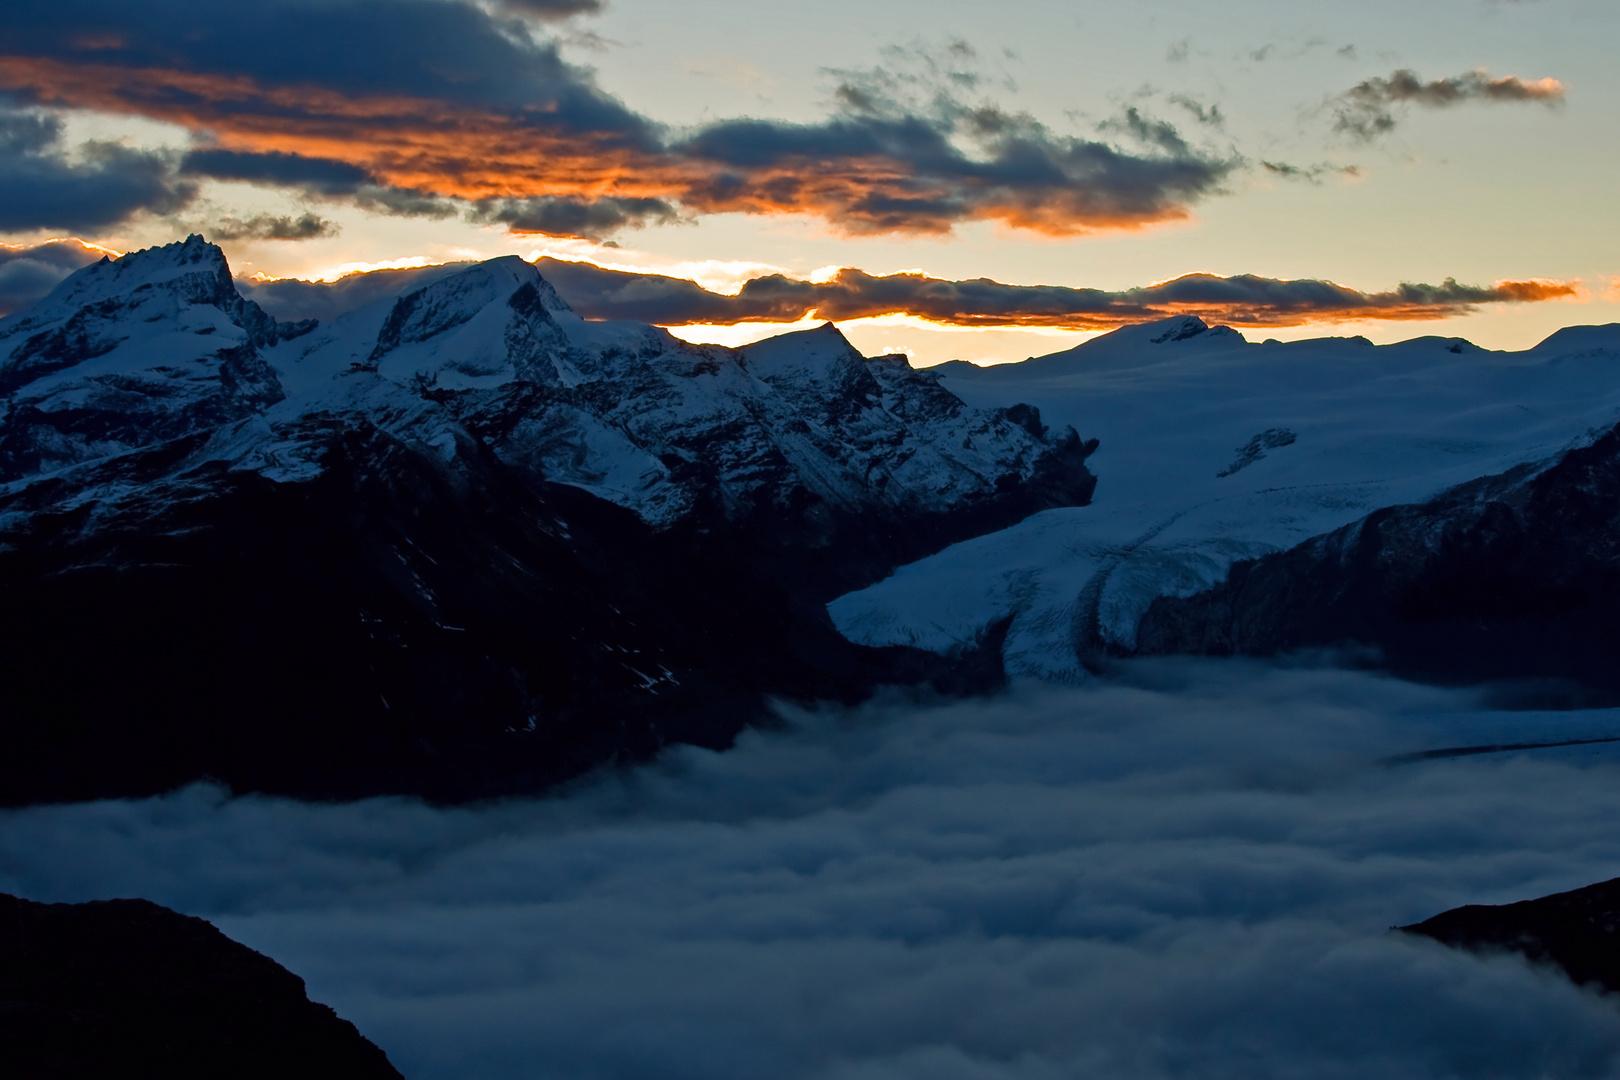 Sonnenaufgang Gandegghütte